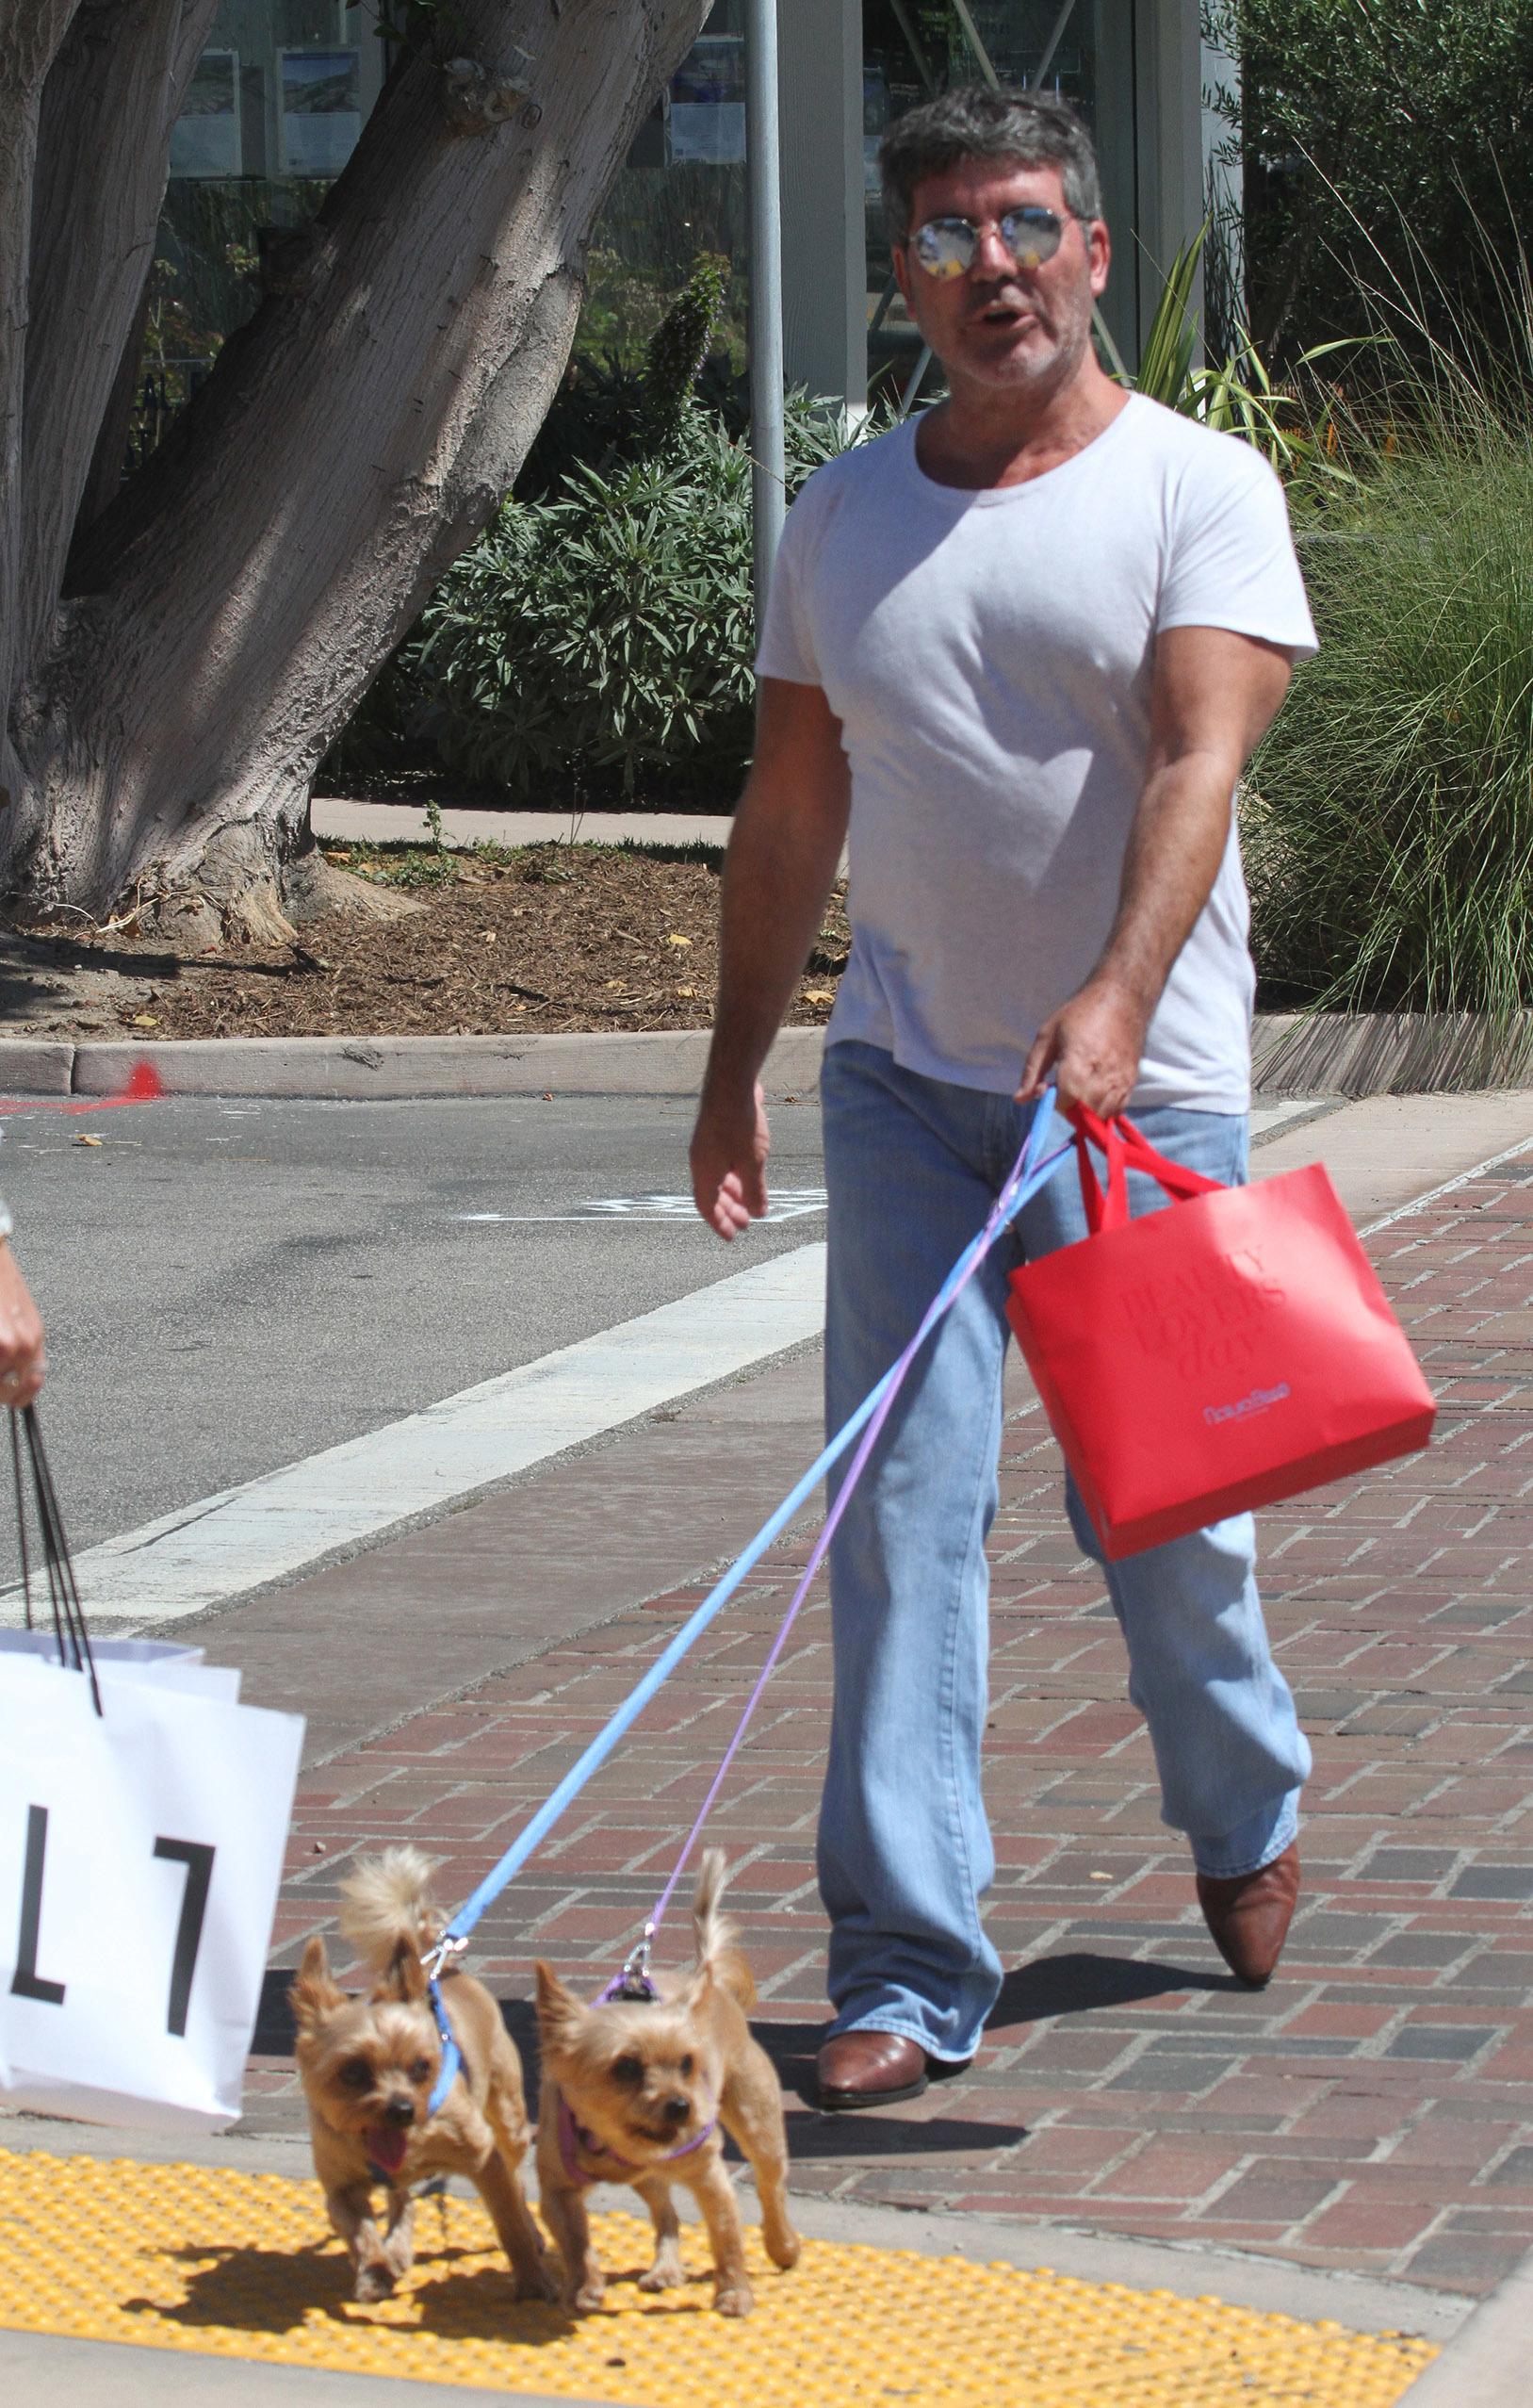 British TV mogul Simon Cowell took his dogs shopping while in Malibu, CA on June 27, 2018.